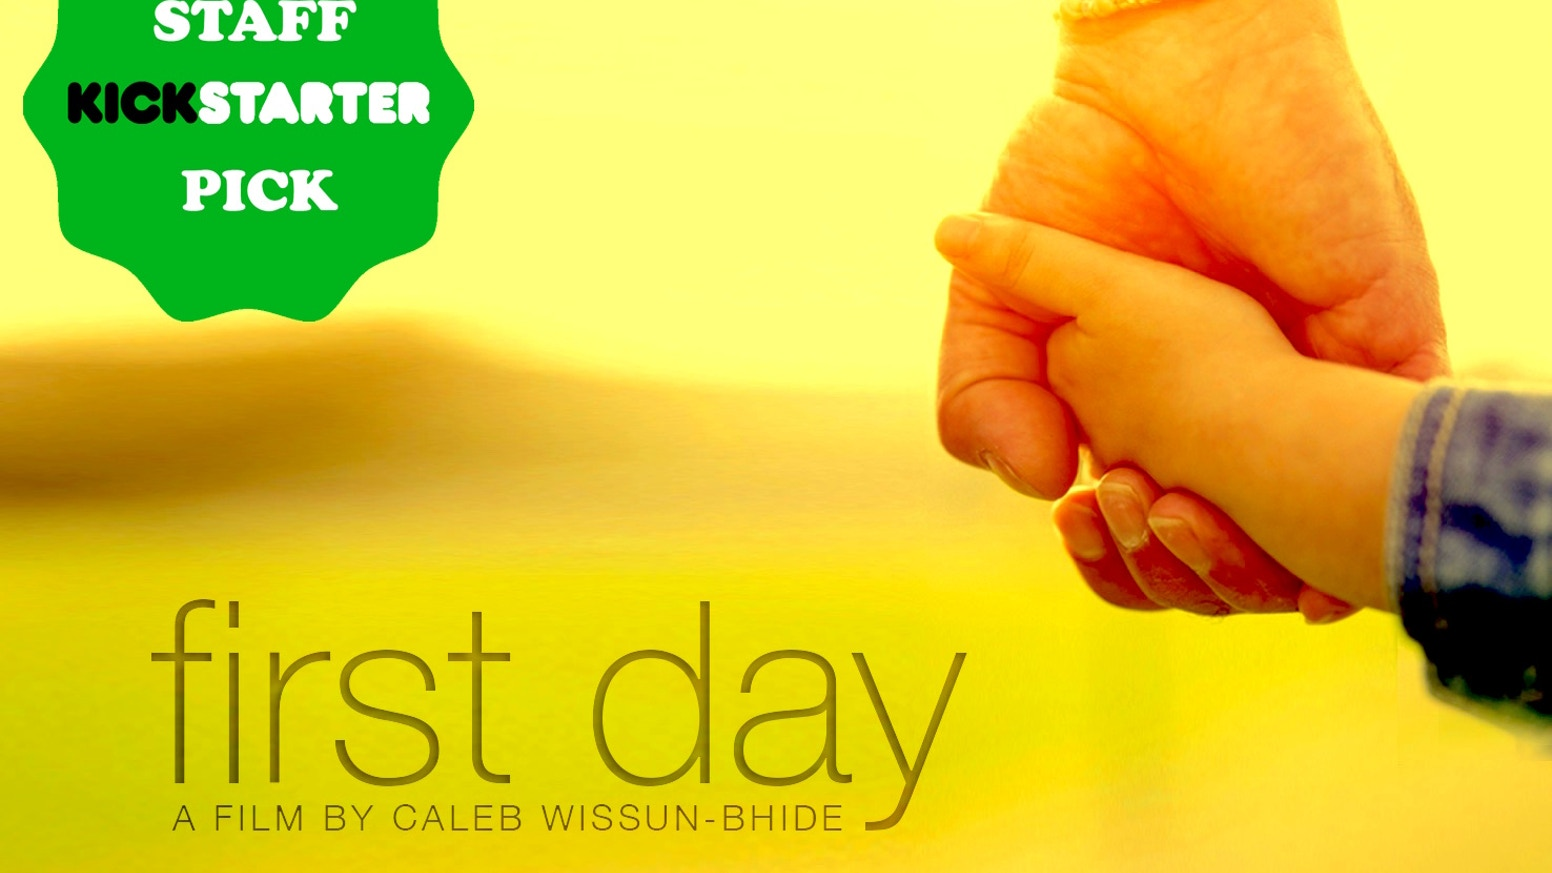 First Day by Caleb Wissun-Bhide » That's a Wrap! — Kickstarter